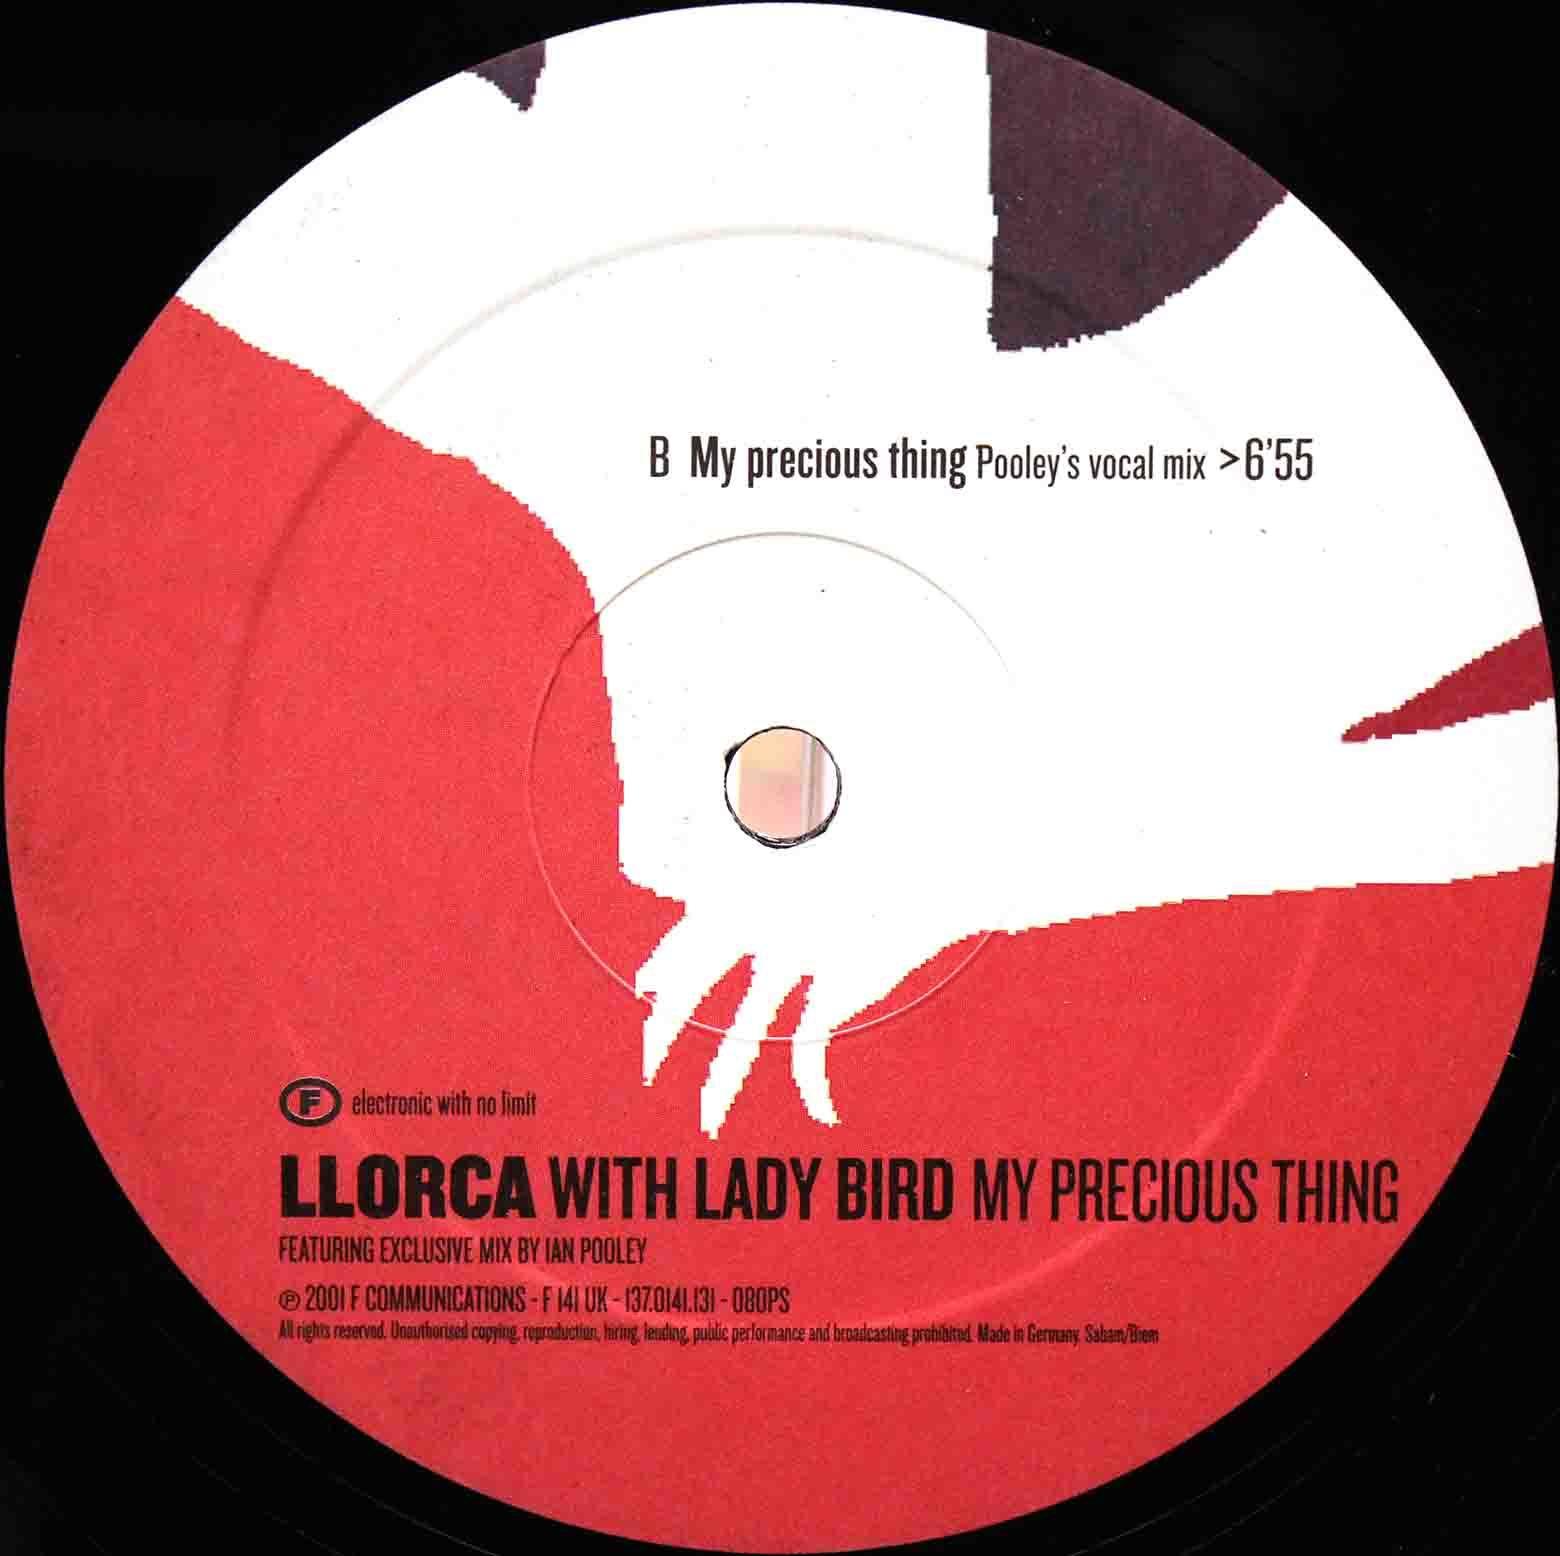 Llorca feat Lady Bird My Precious Thing 01 (3)